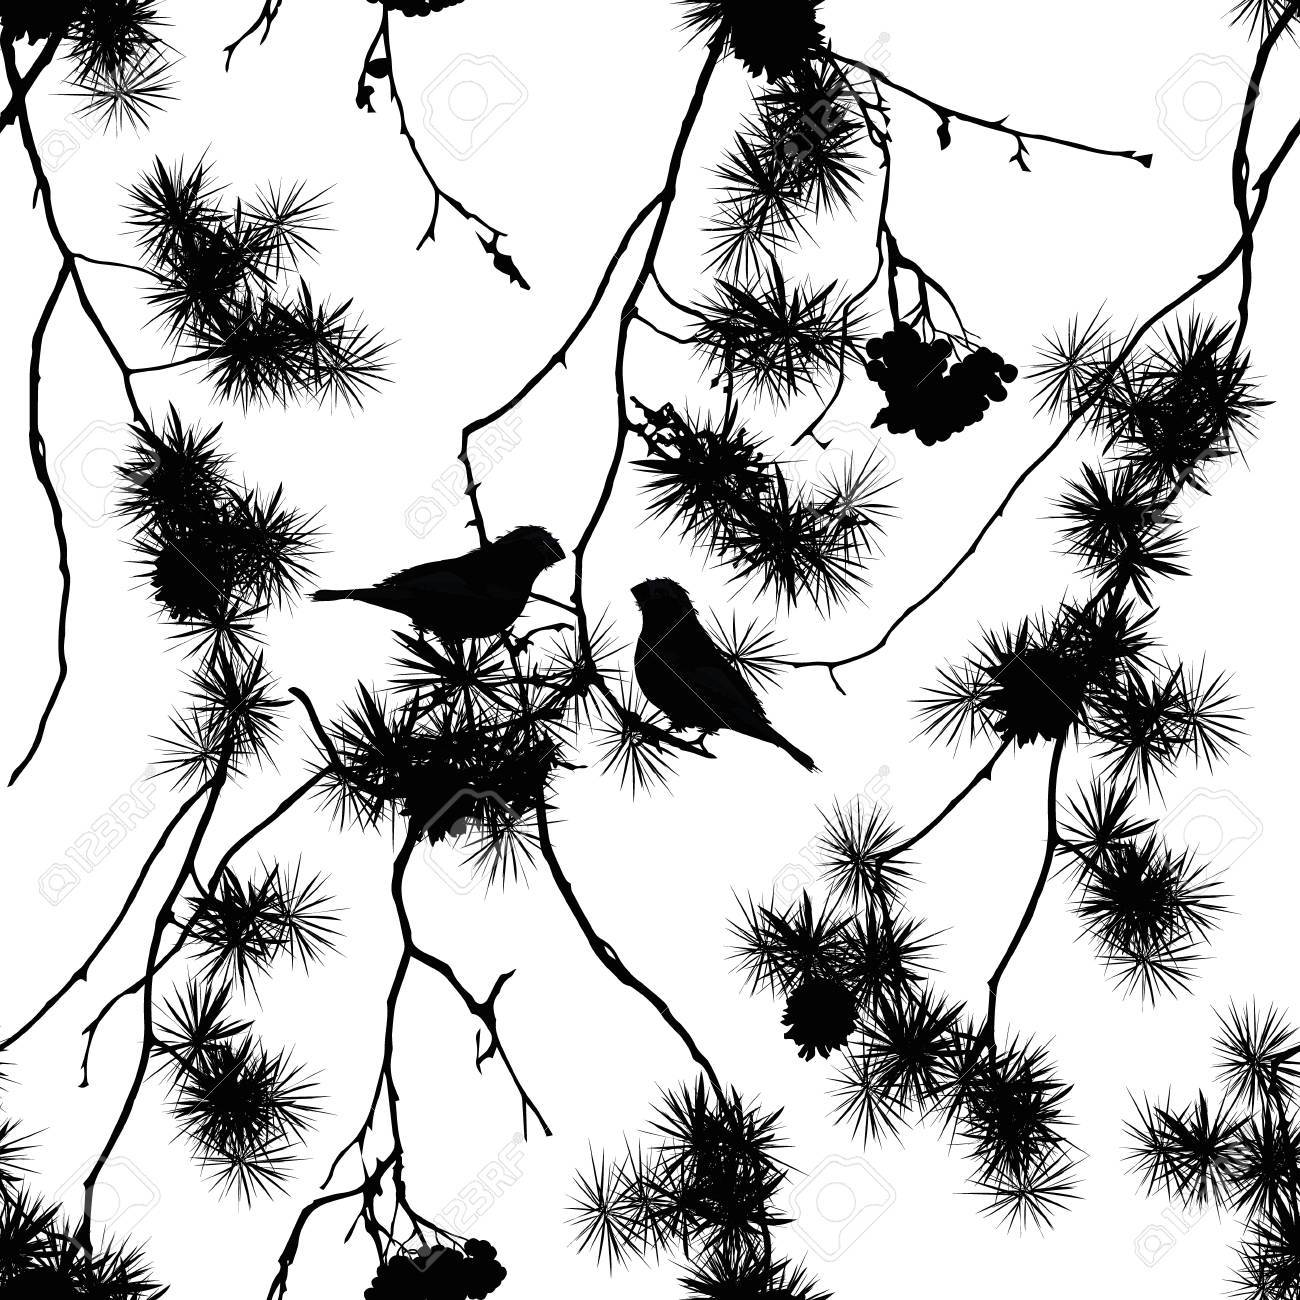 Birds on pine branches seamless print - 33744123